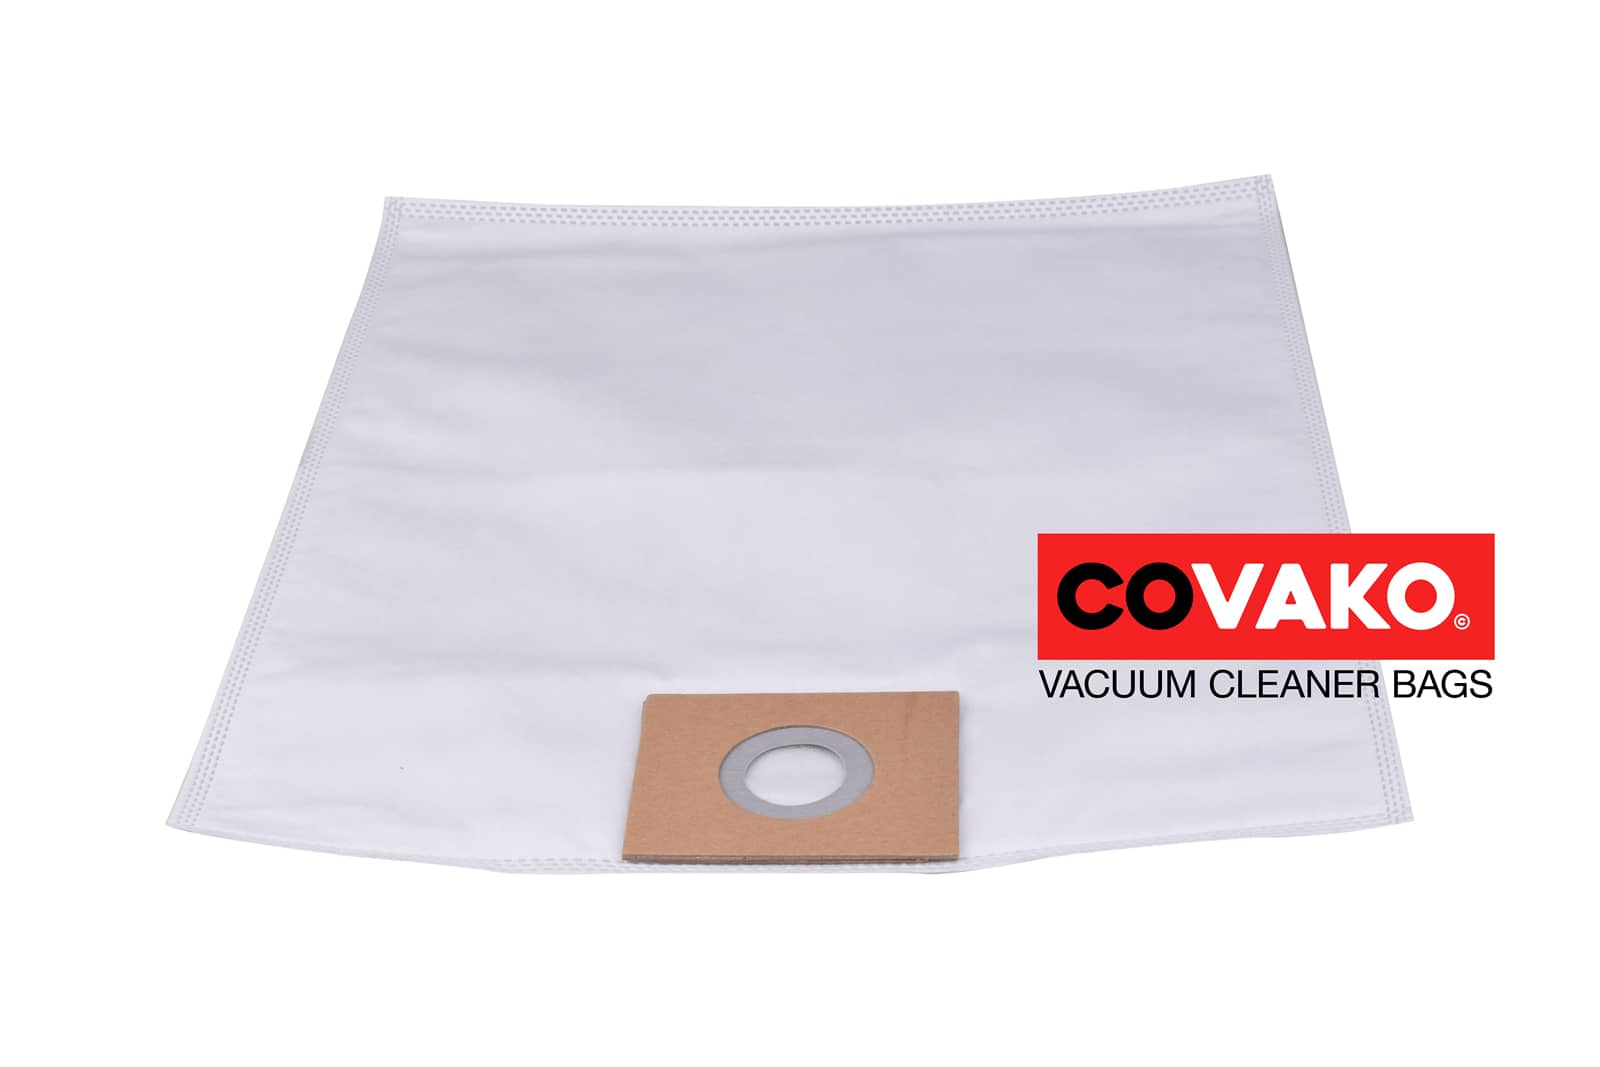 I-vac Dryver 10R / Synthetisch - I-vac Staubsaugerbeutel